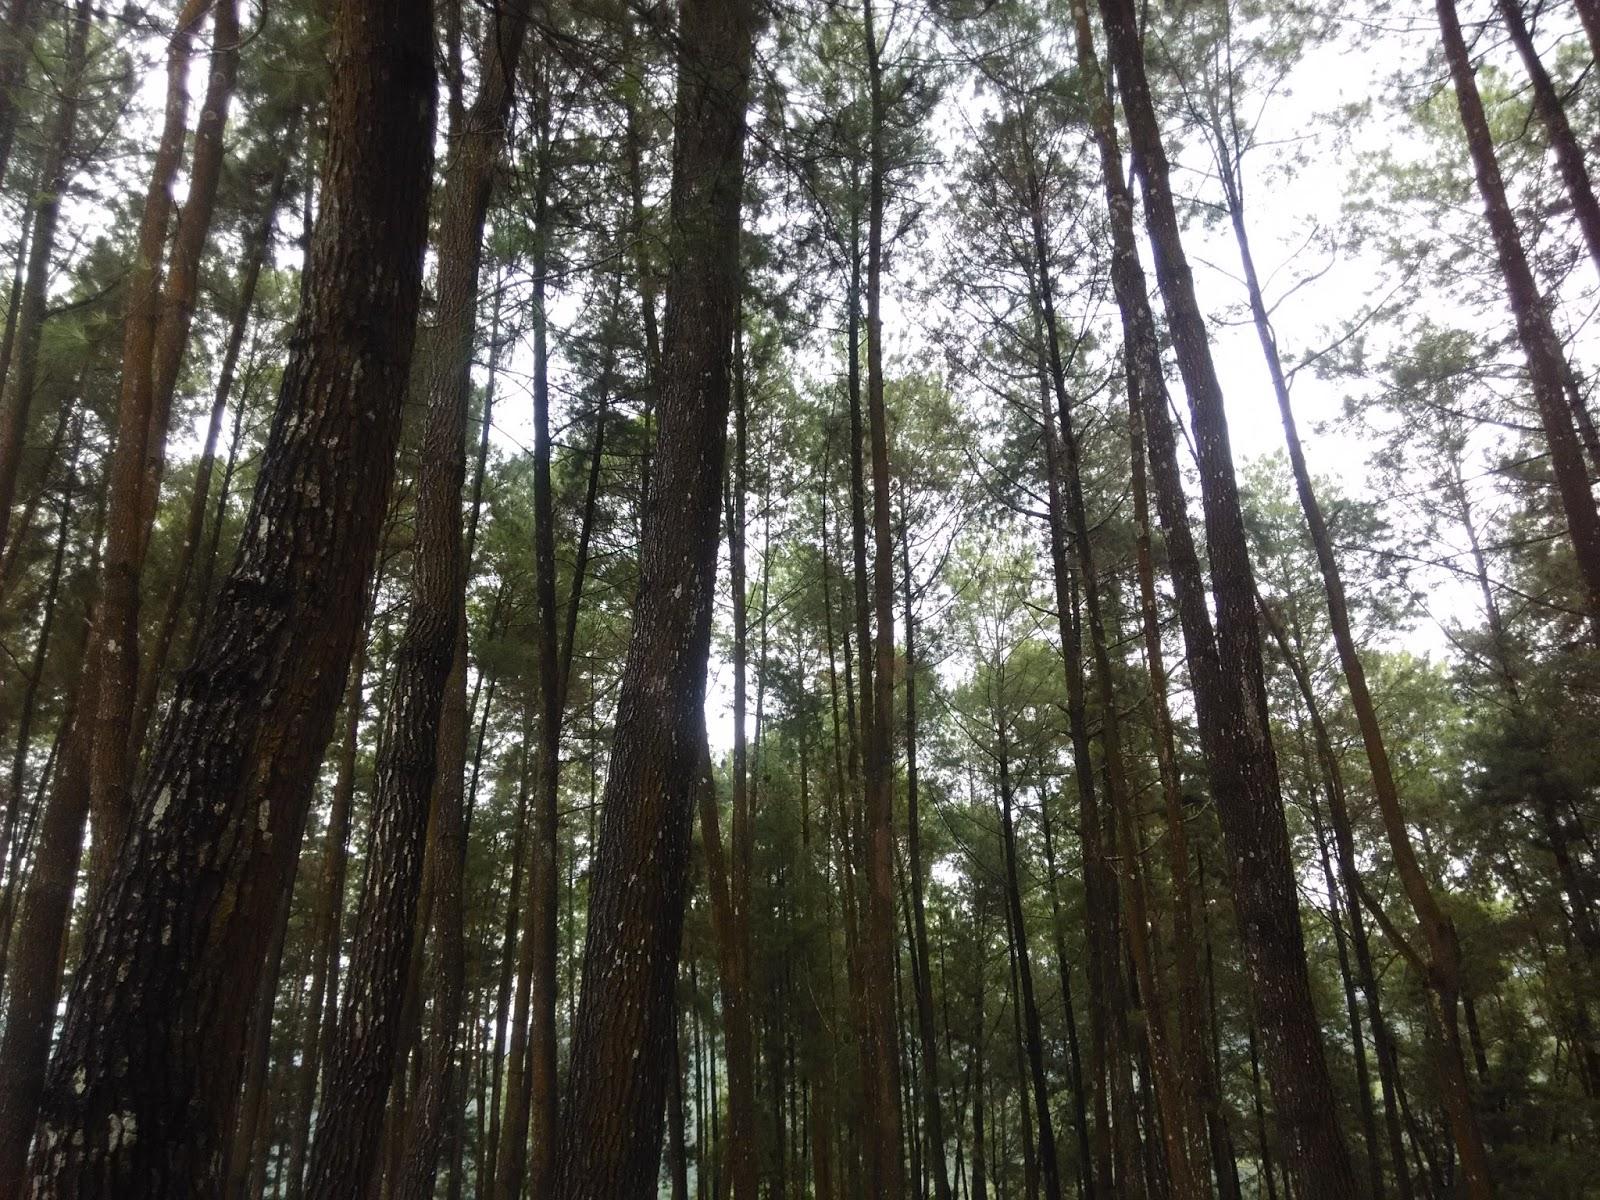 Destinasi Wisata Hutan Pinus Nongko Ijo Kecamatan Kare Kab Madiun